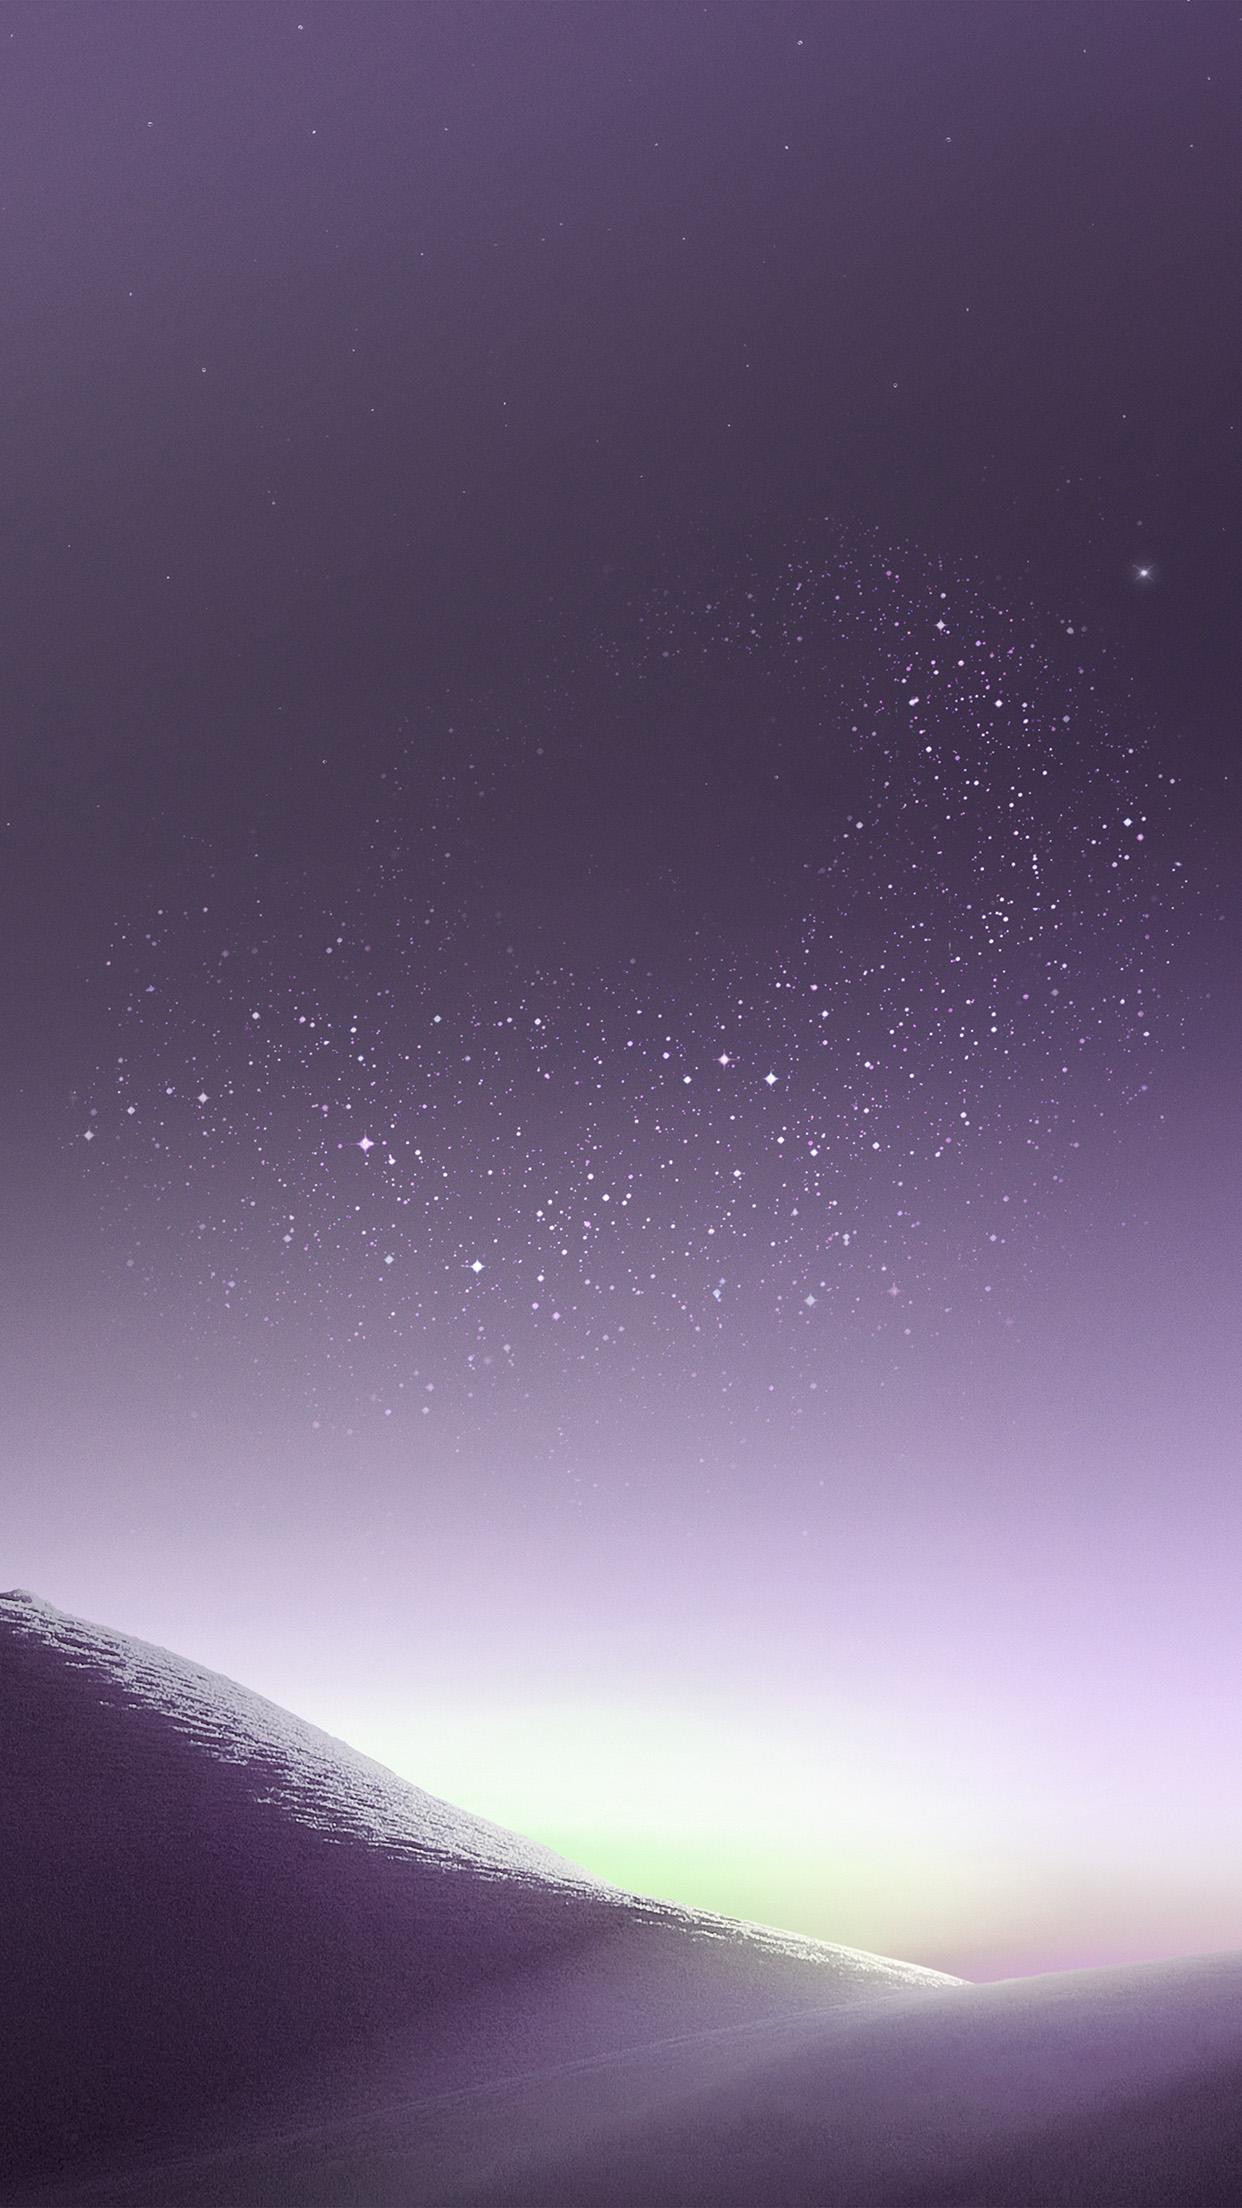 papers.co bc36 galaxy night sky star art illustration samsung purple 34 iphone6 plus wallpaper